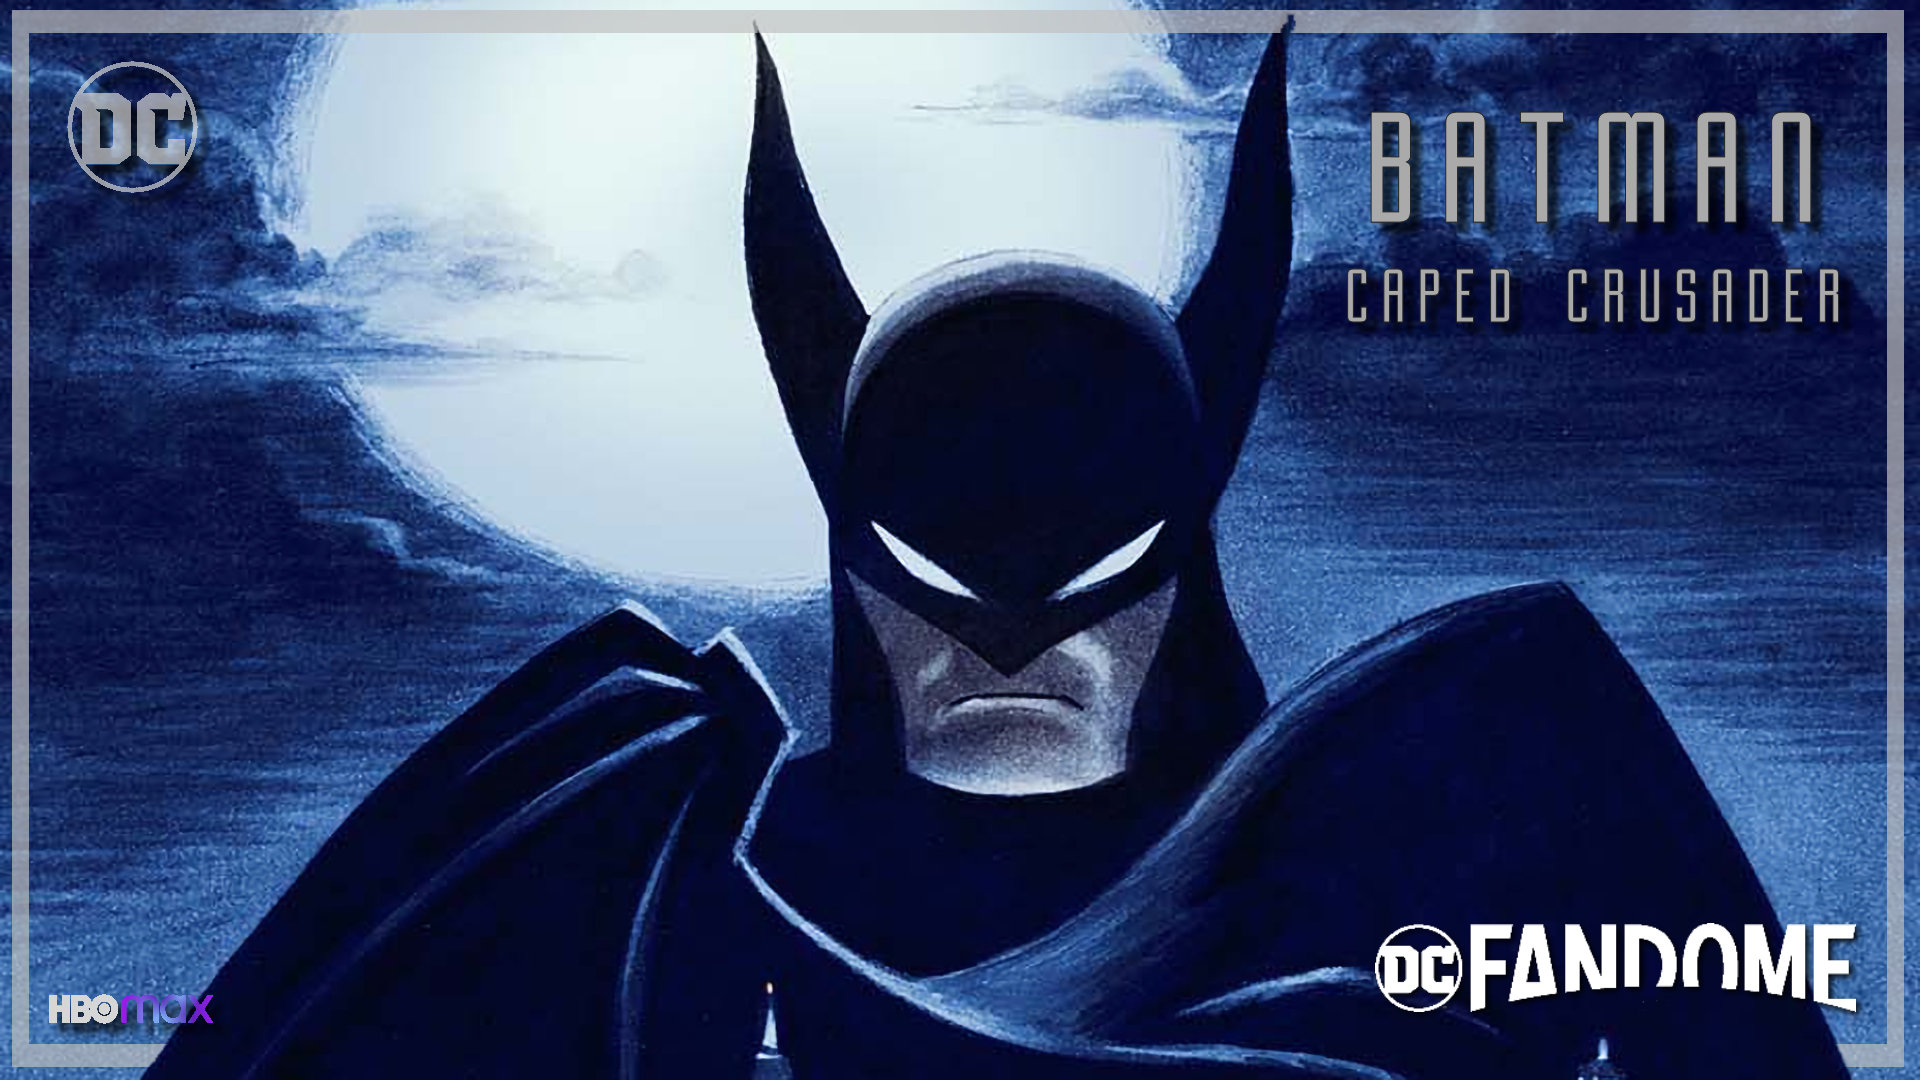 DC FanDome: Fresh Details About 'Batman: Caped Crusader'